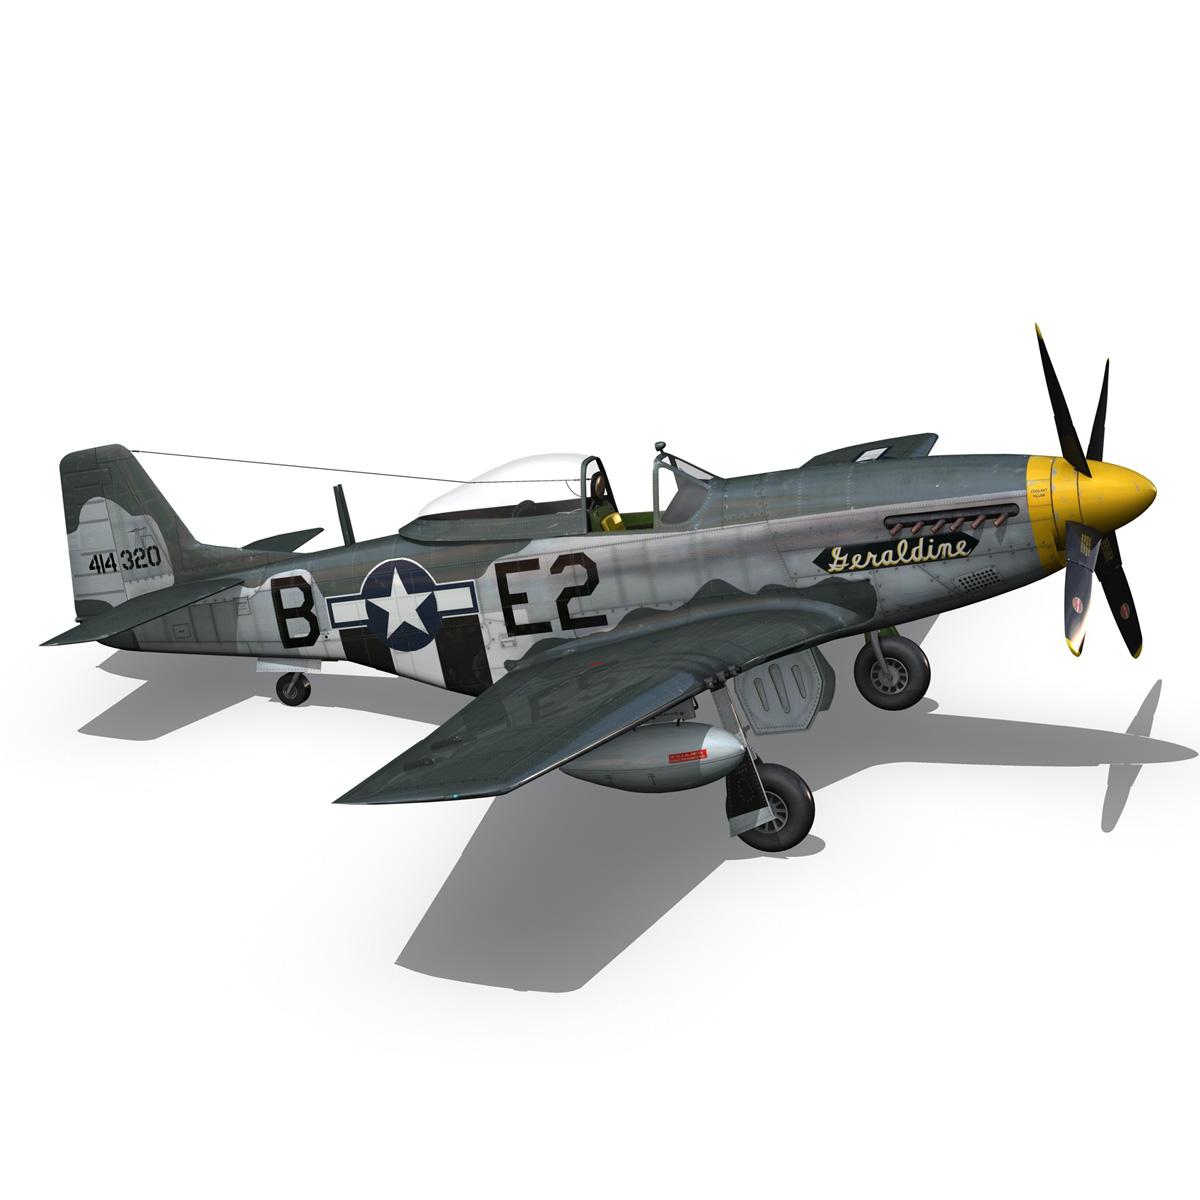 North American P-51D - Geraldine 3d model fbx c4d lwo obj 265949